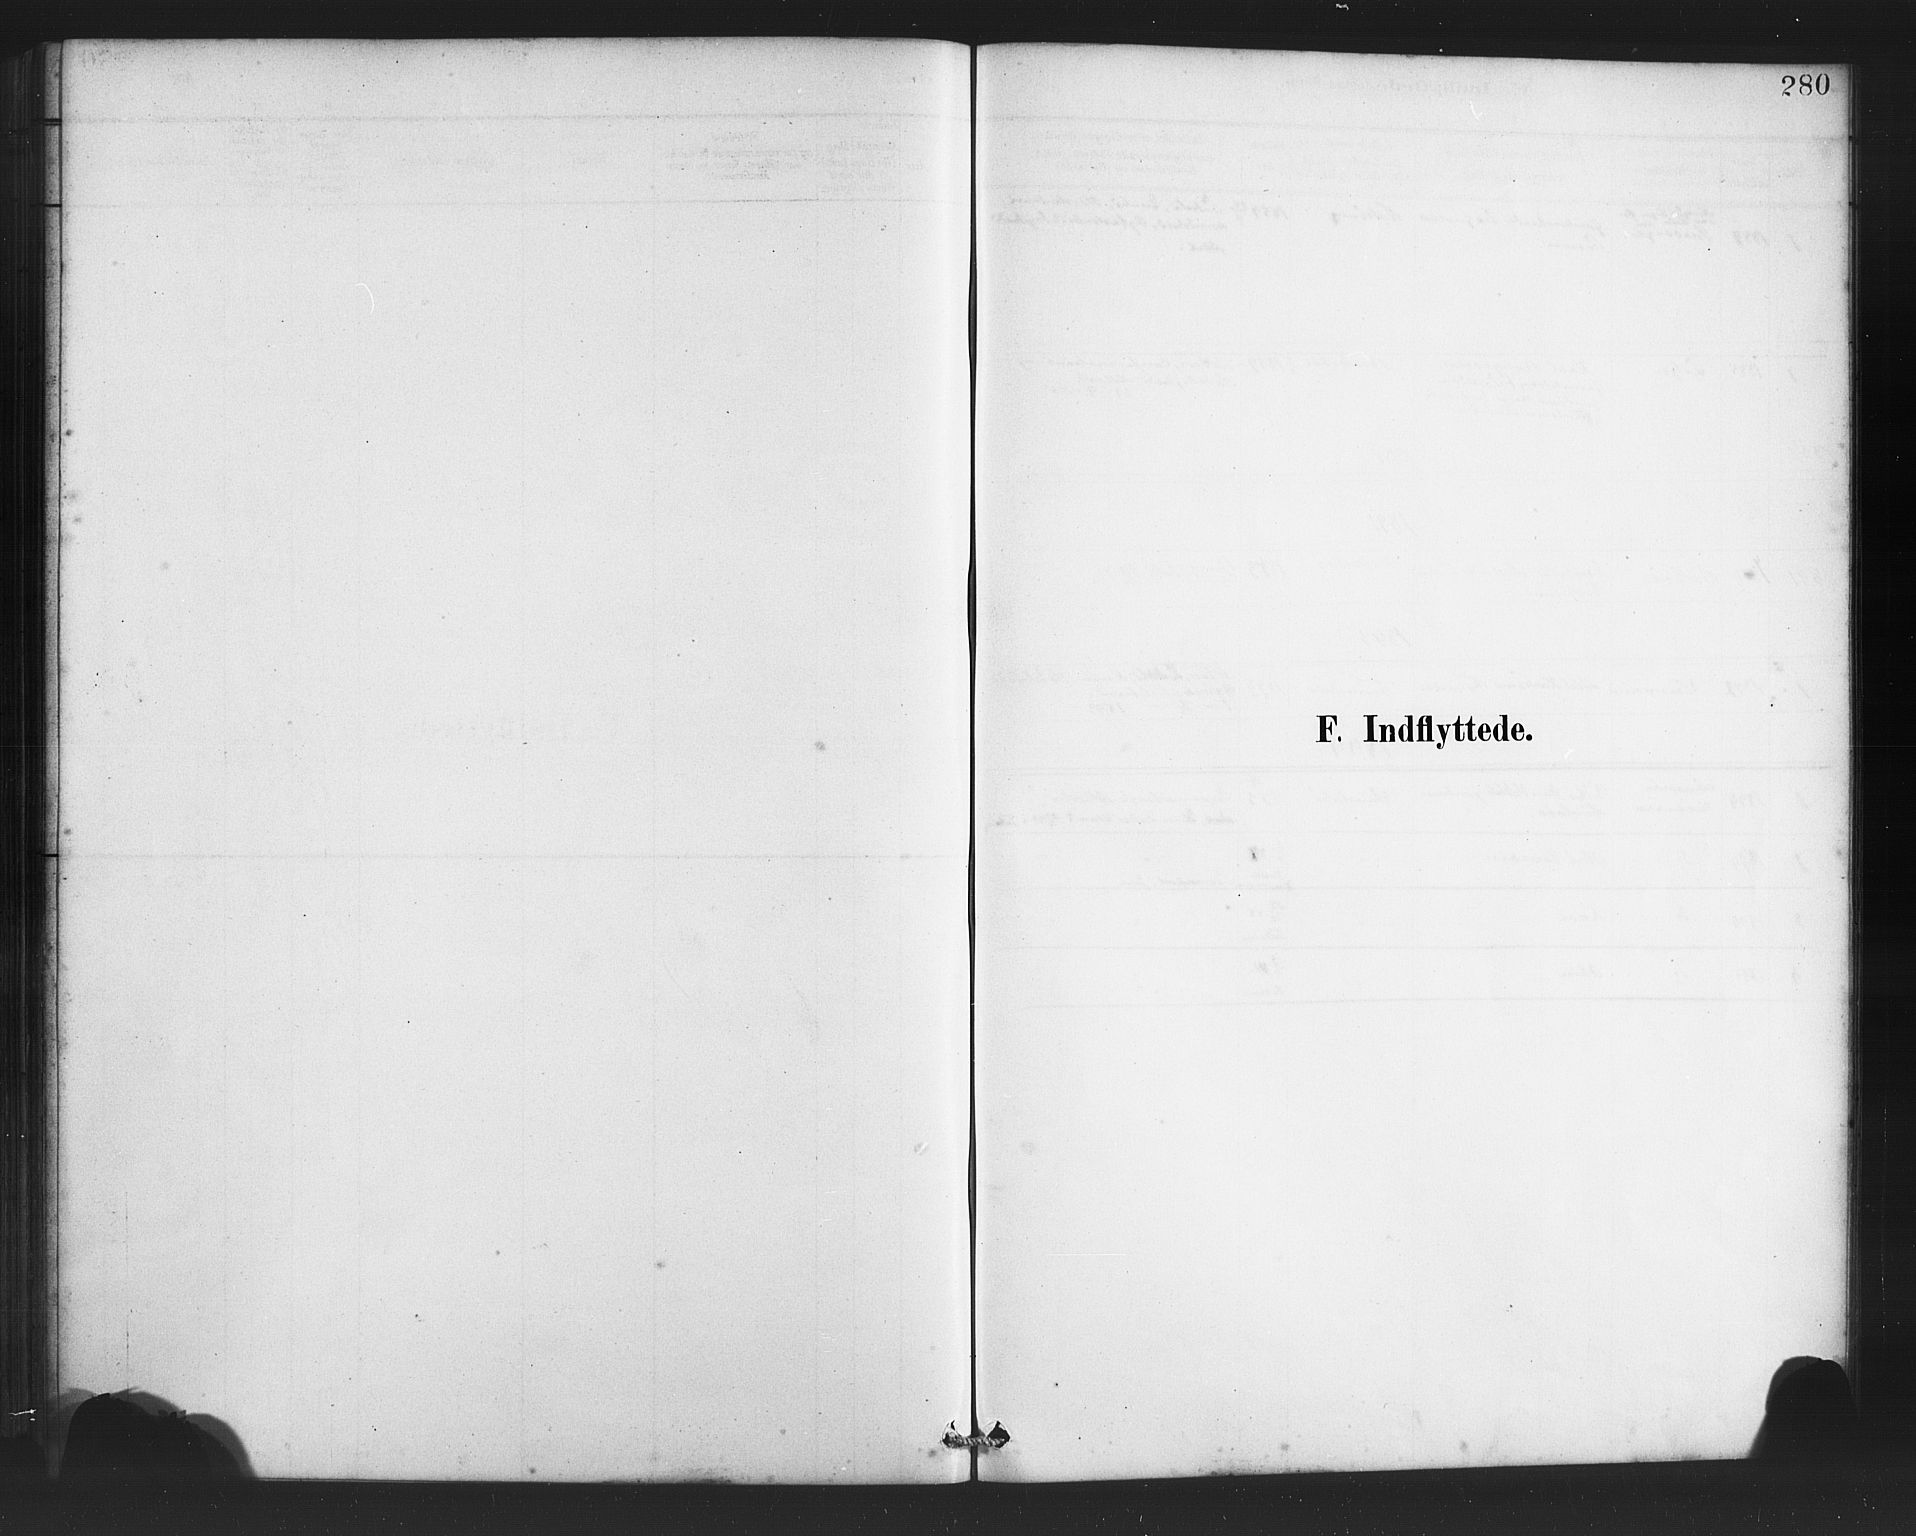 SAB, Finnås sokneprestembete, H/Ha/Haa/Haac/L0001: Ministerialbok nr. C 1, 1881-1894, s. 280